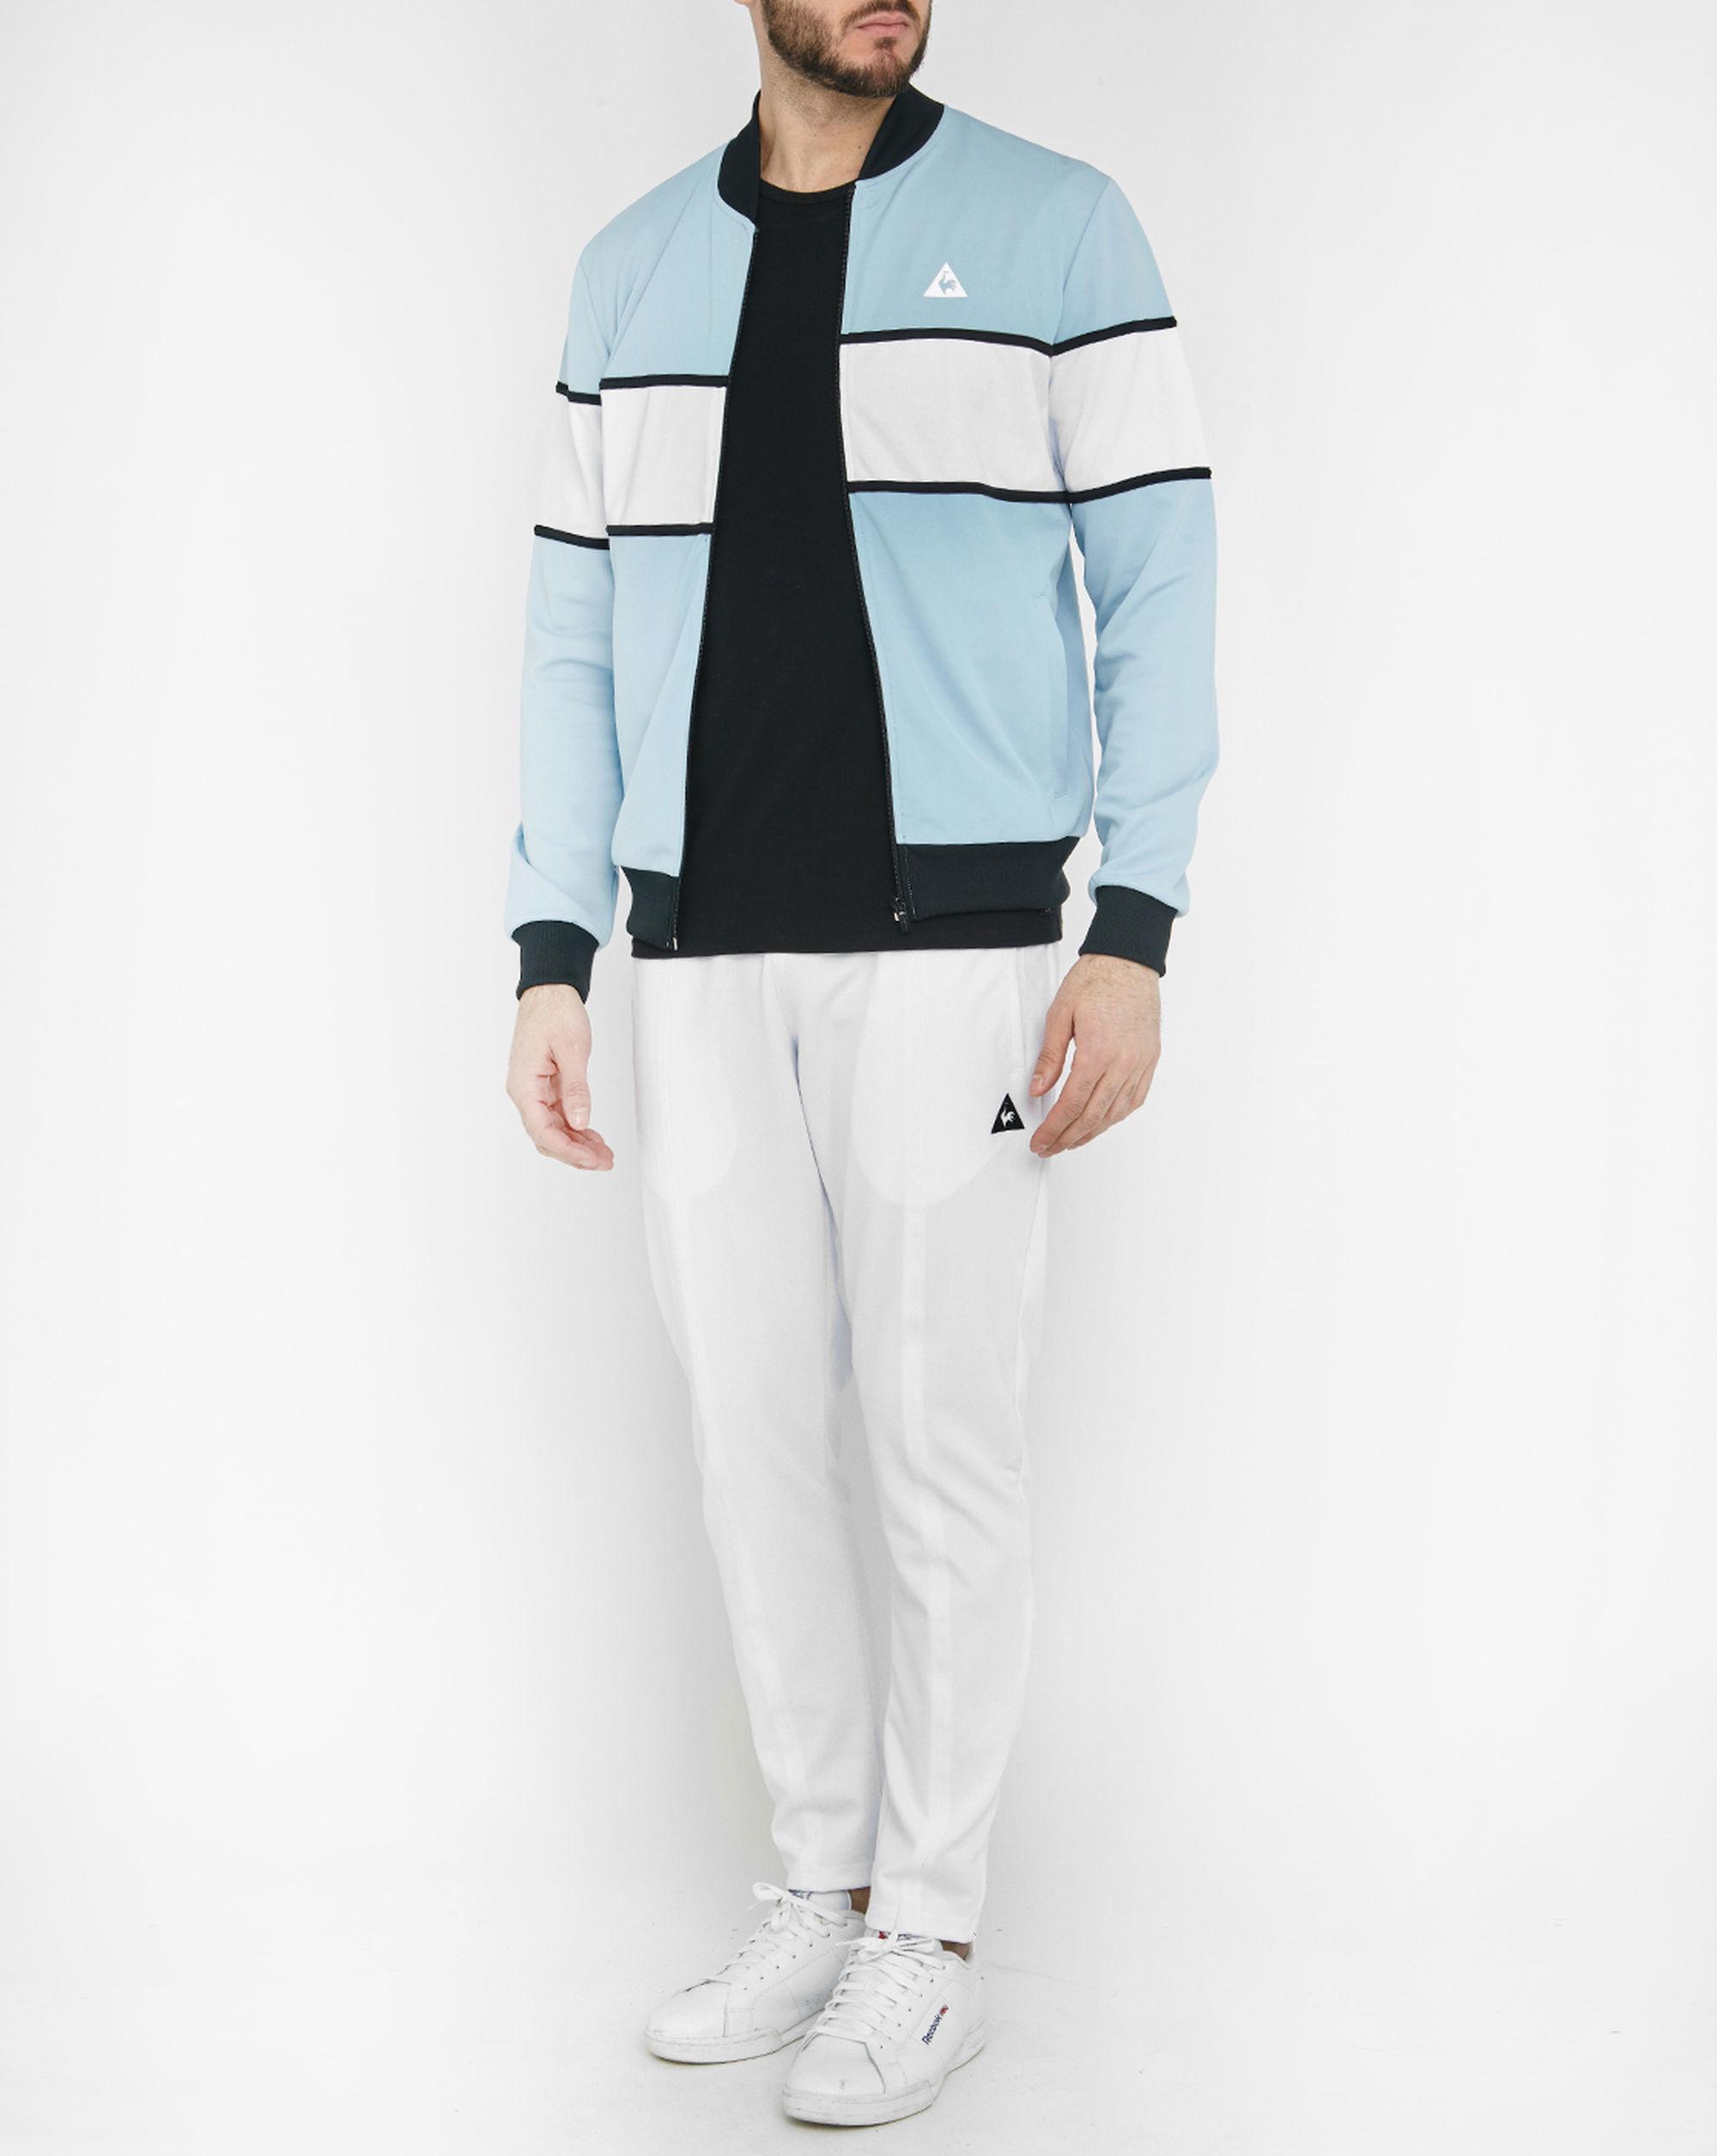 le coq sportif sky blue colour block track jacket in blue for men lyst. Black Bedroom Furniture Sets. Home Design Ideas